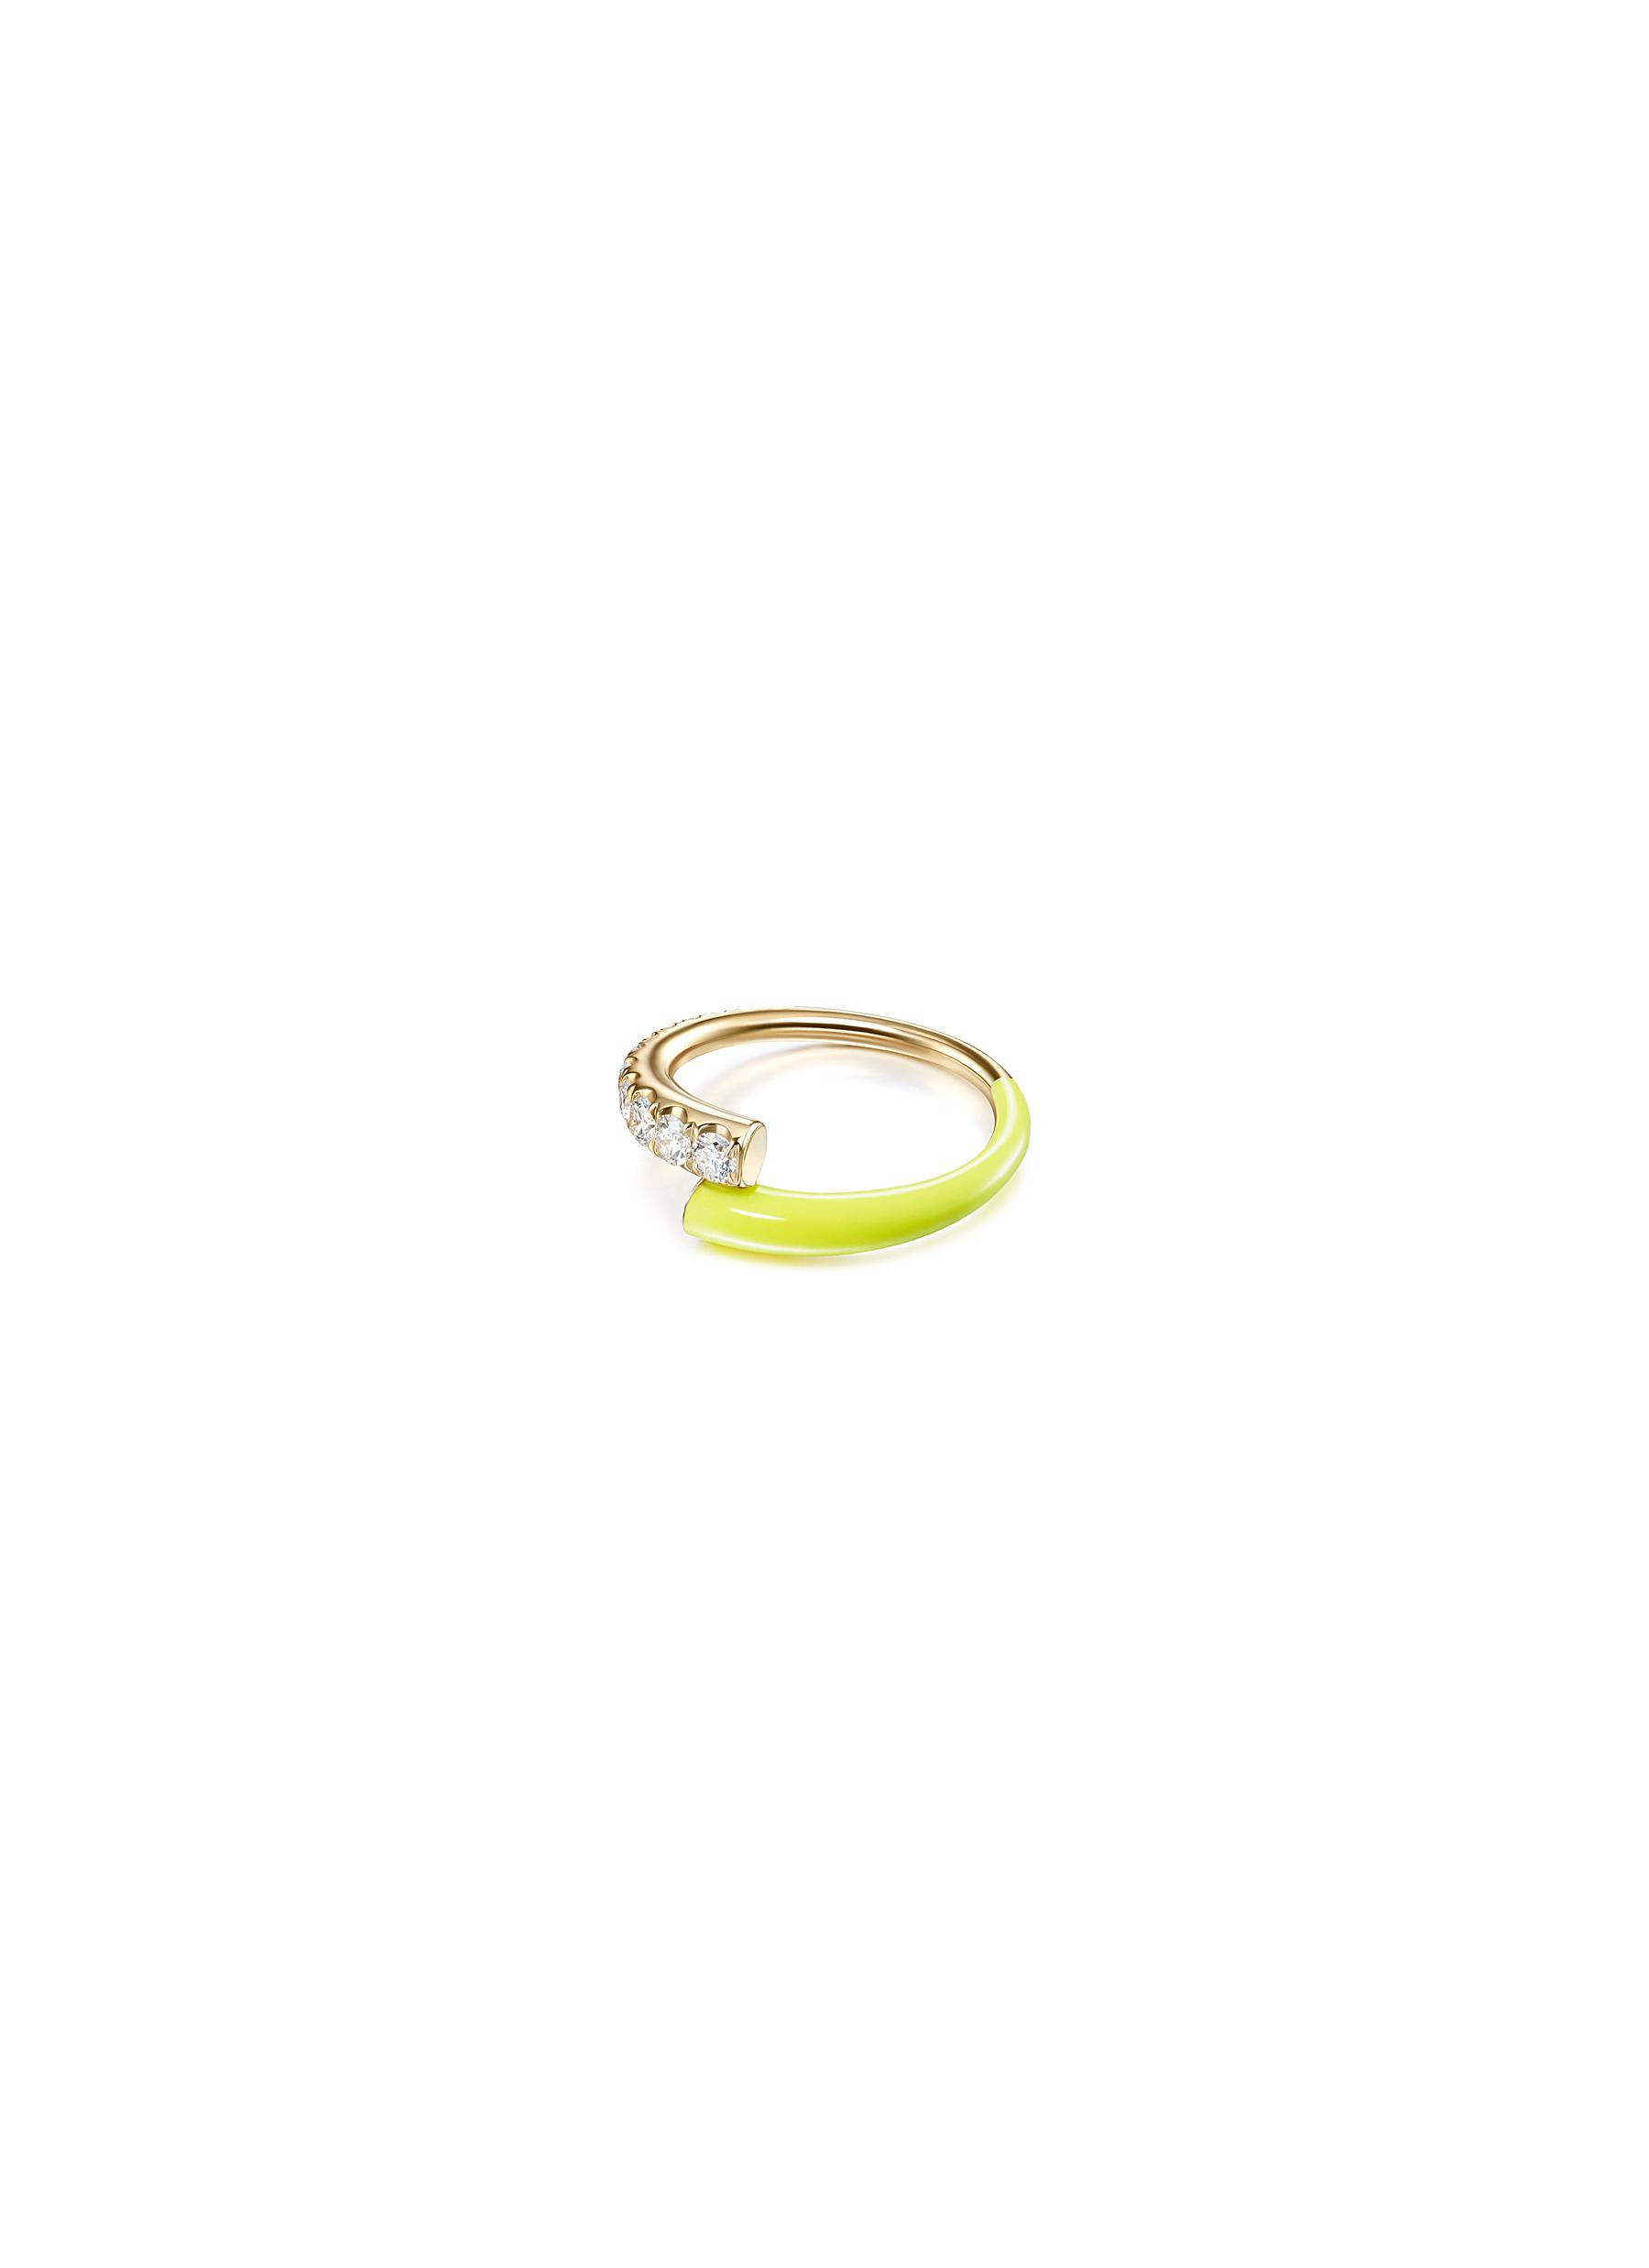 'Lola' Diamond 18k Gold Enamel Accent Ring